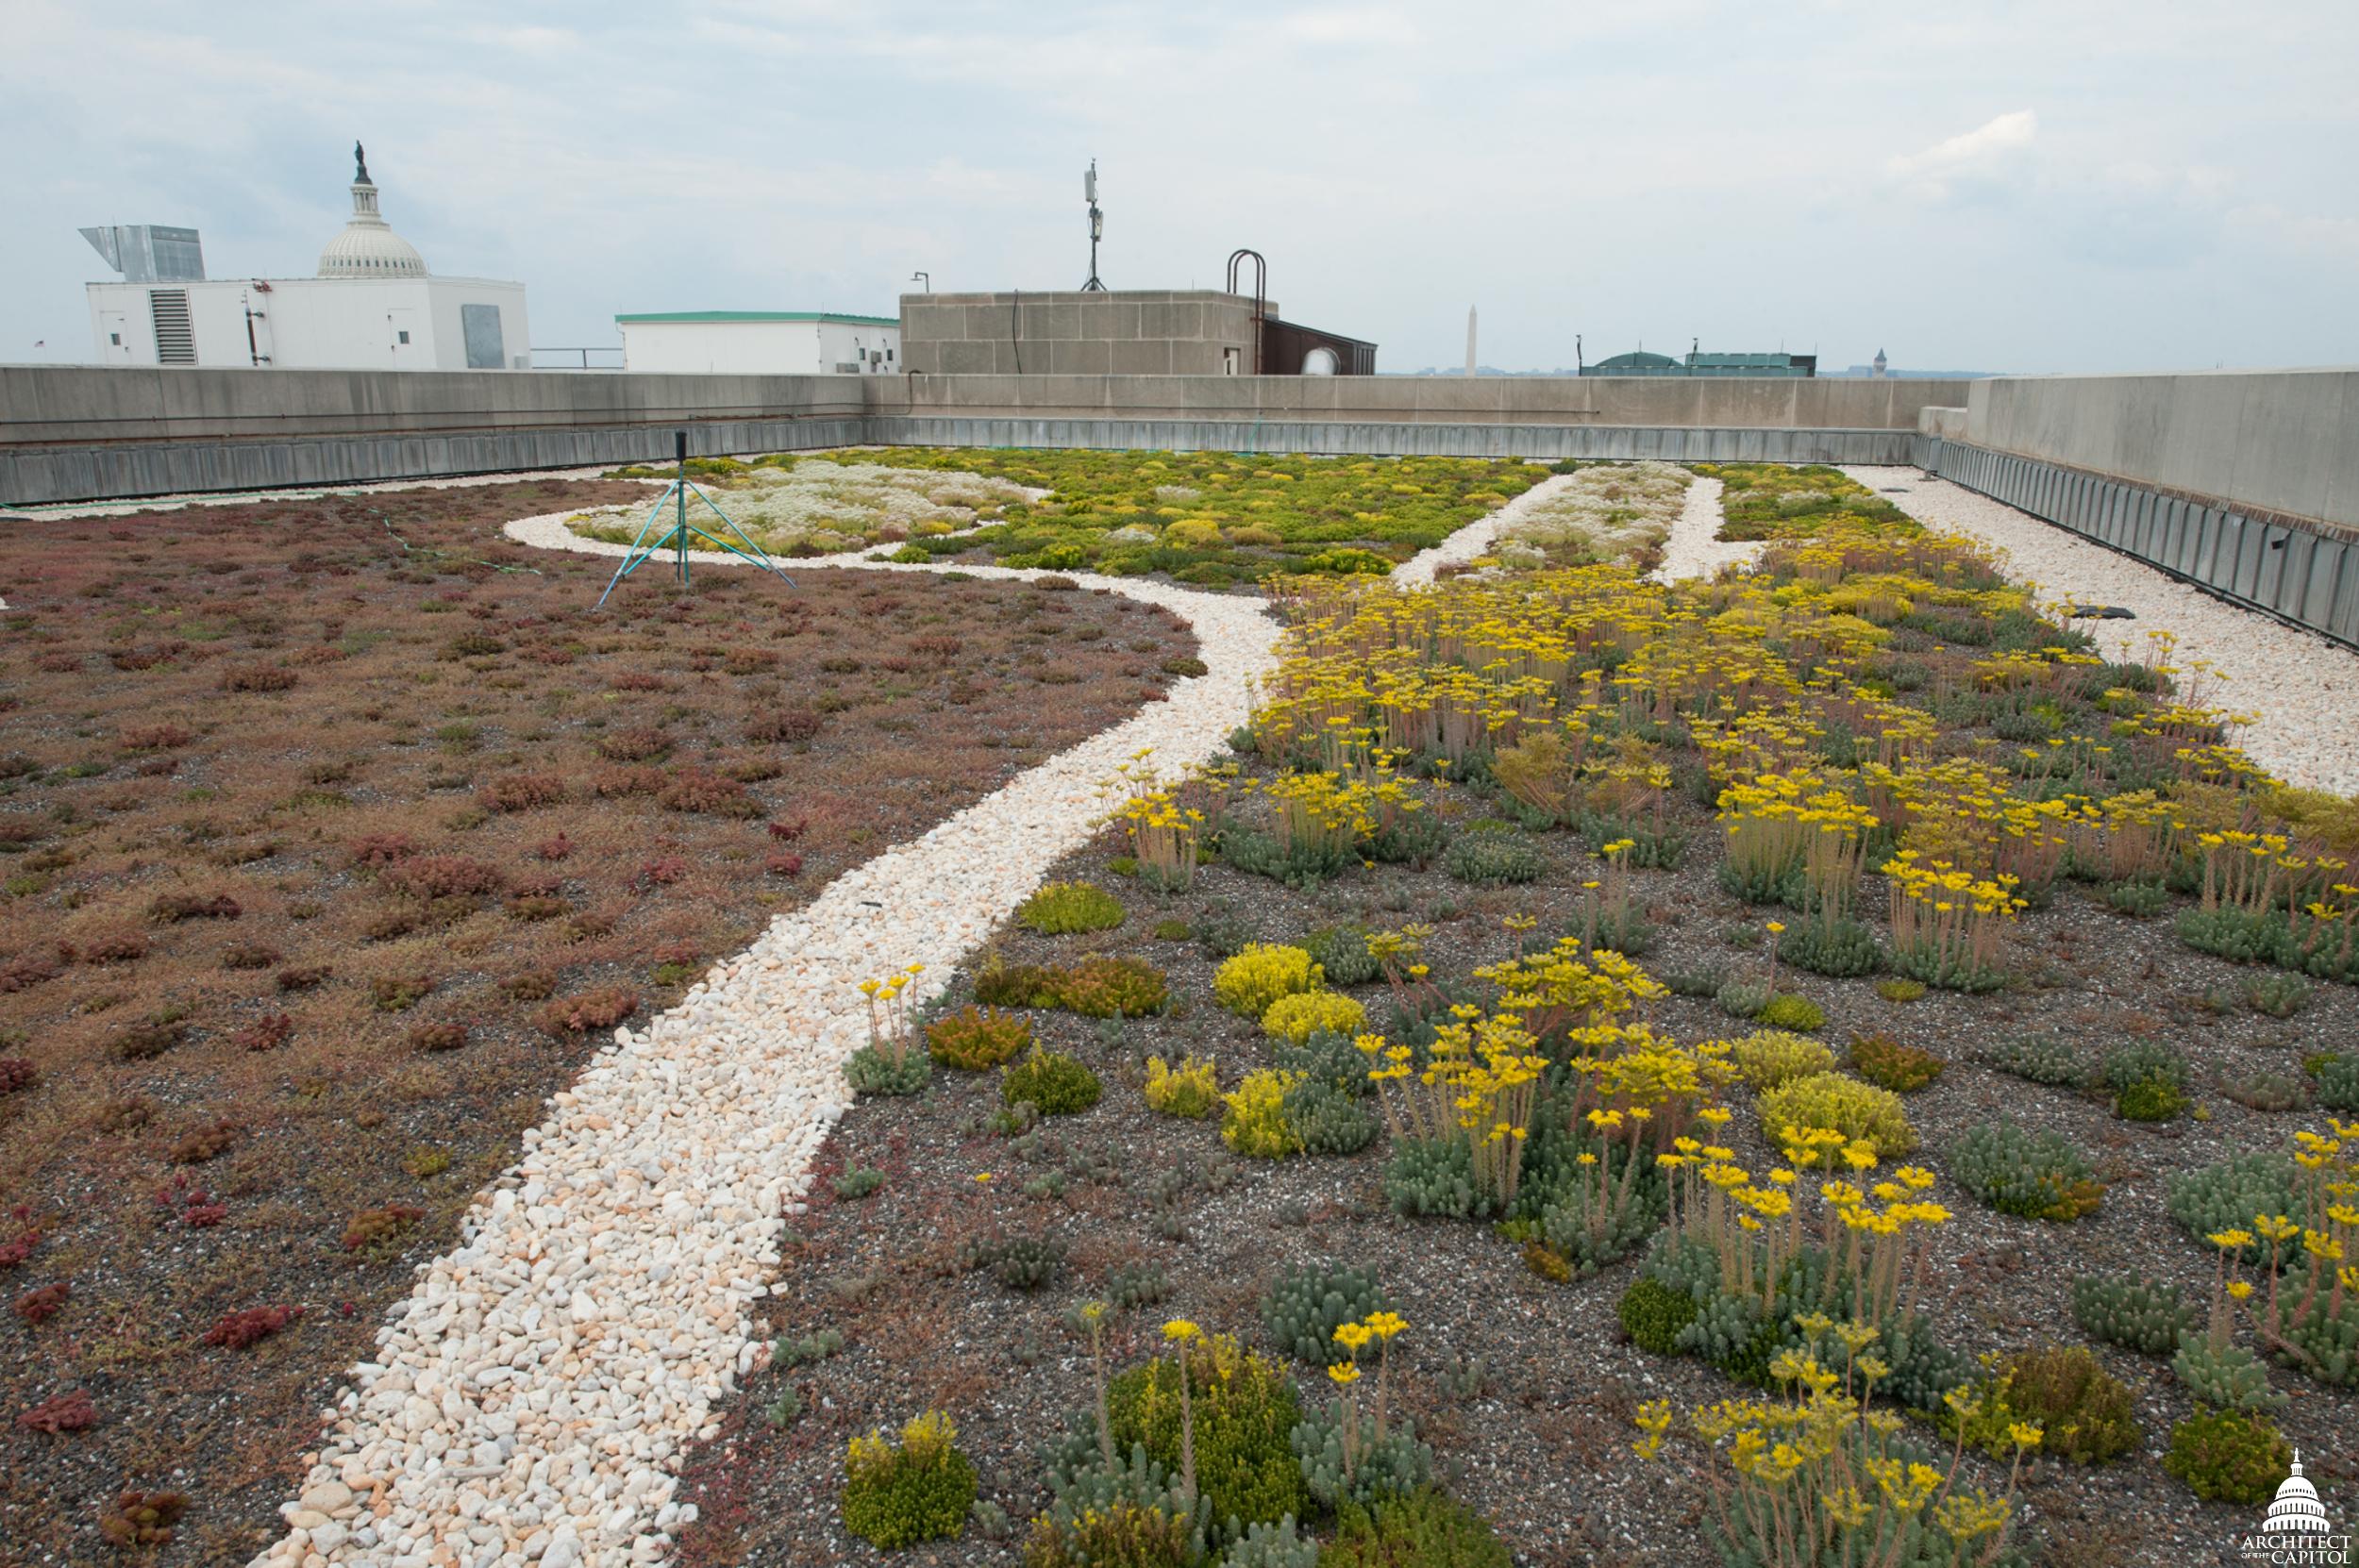 The Dirksen Building green roof thriving.